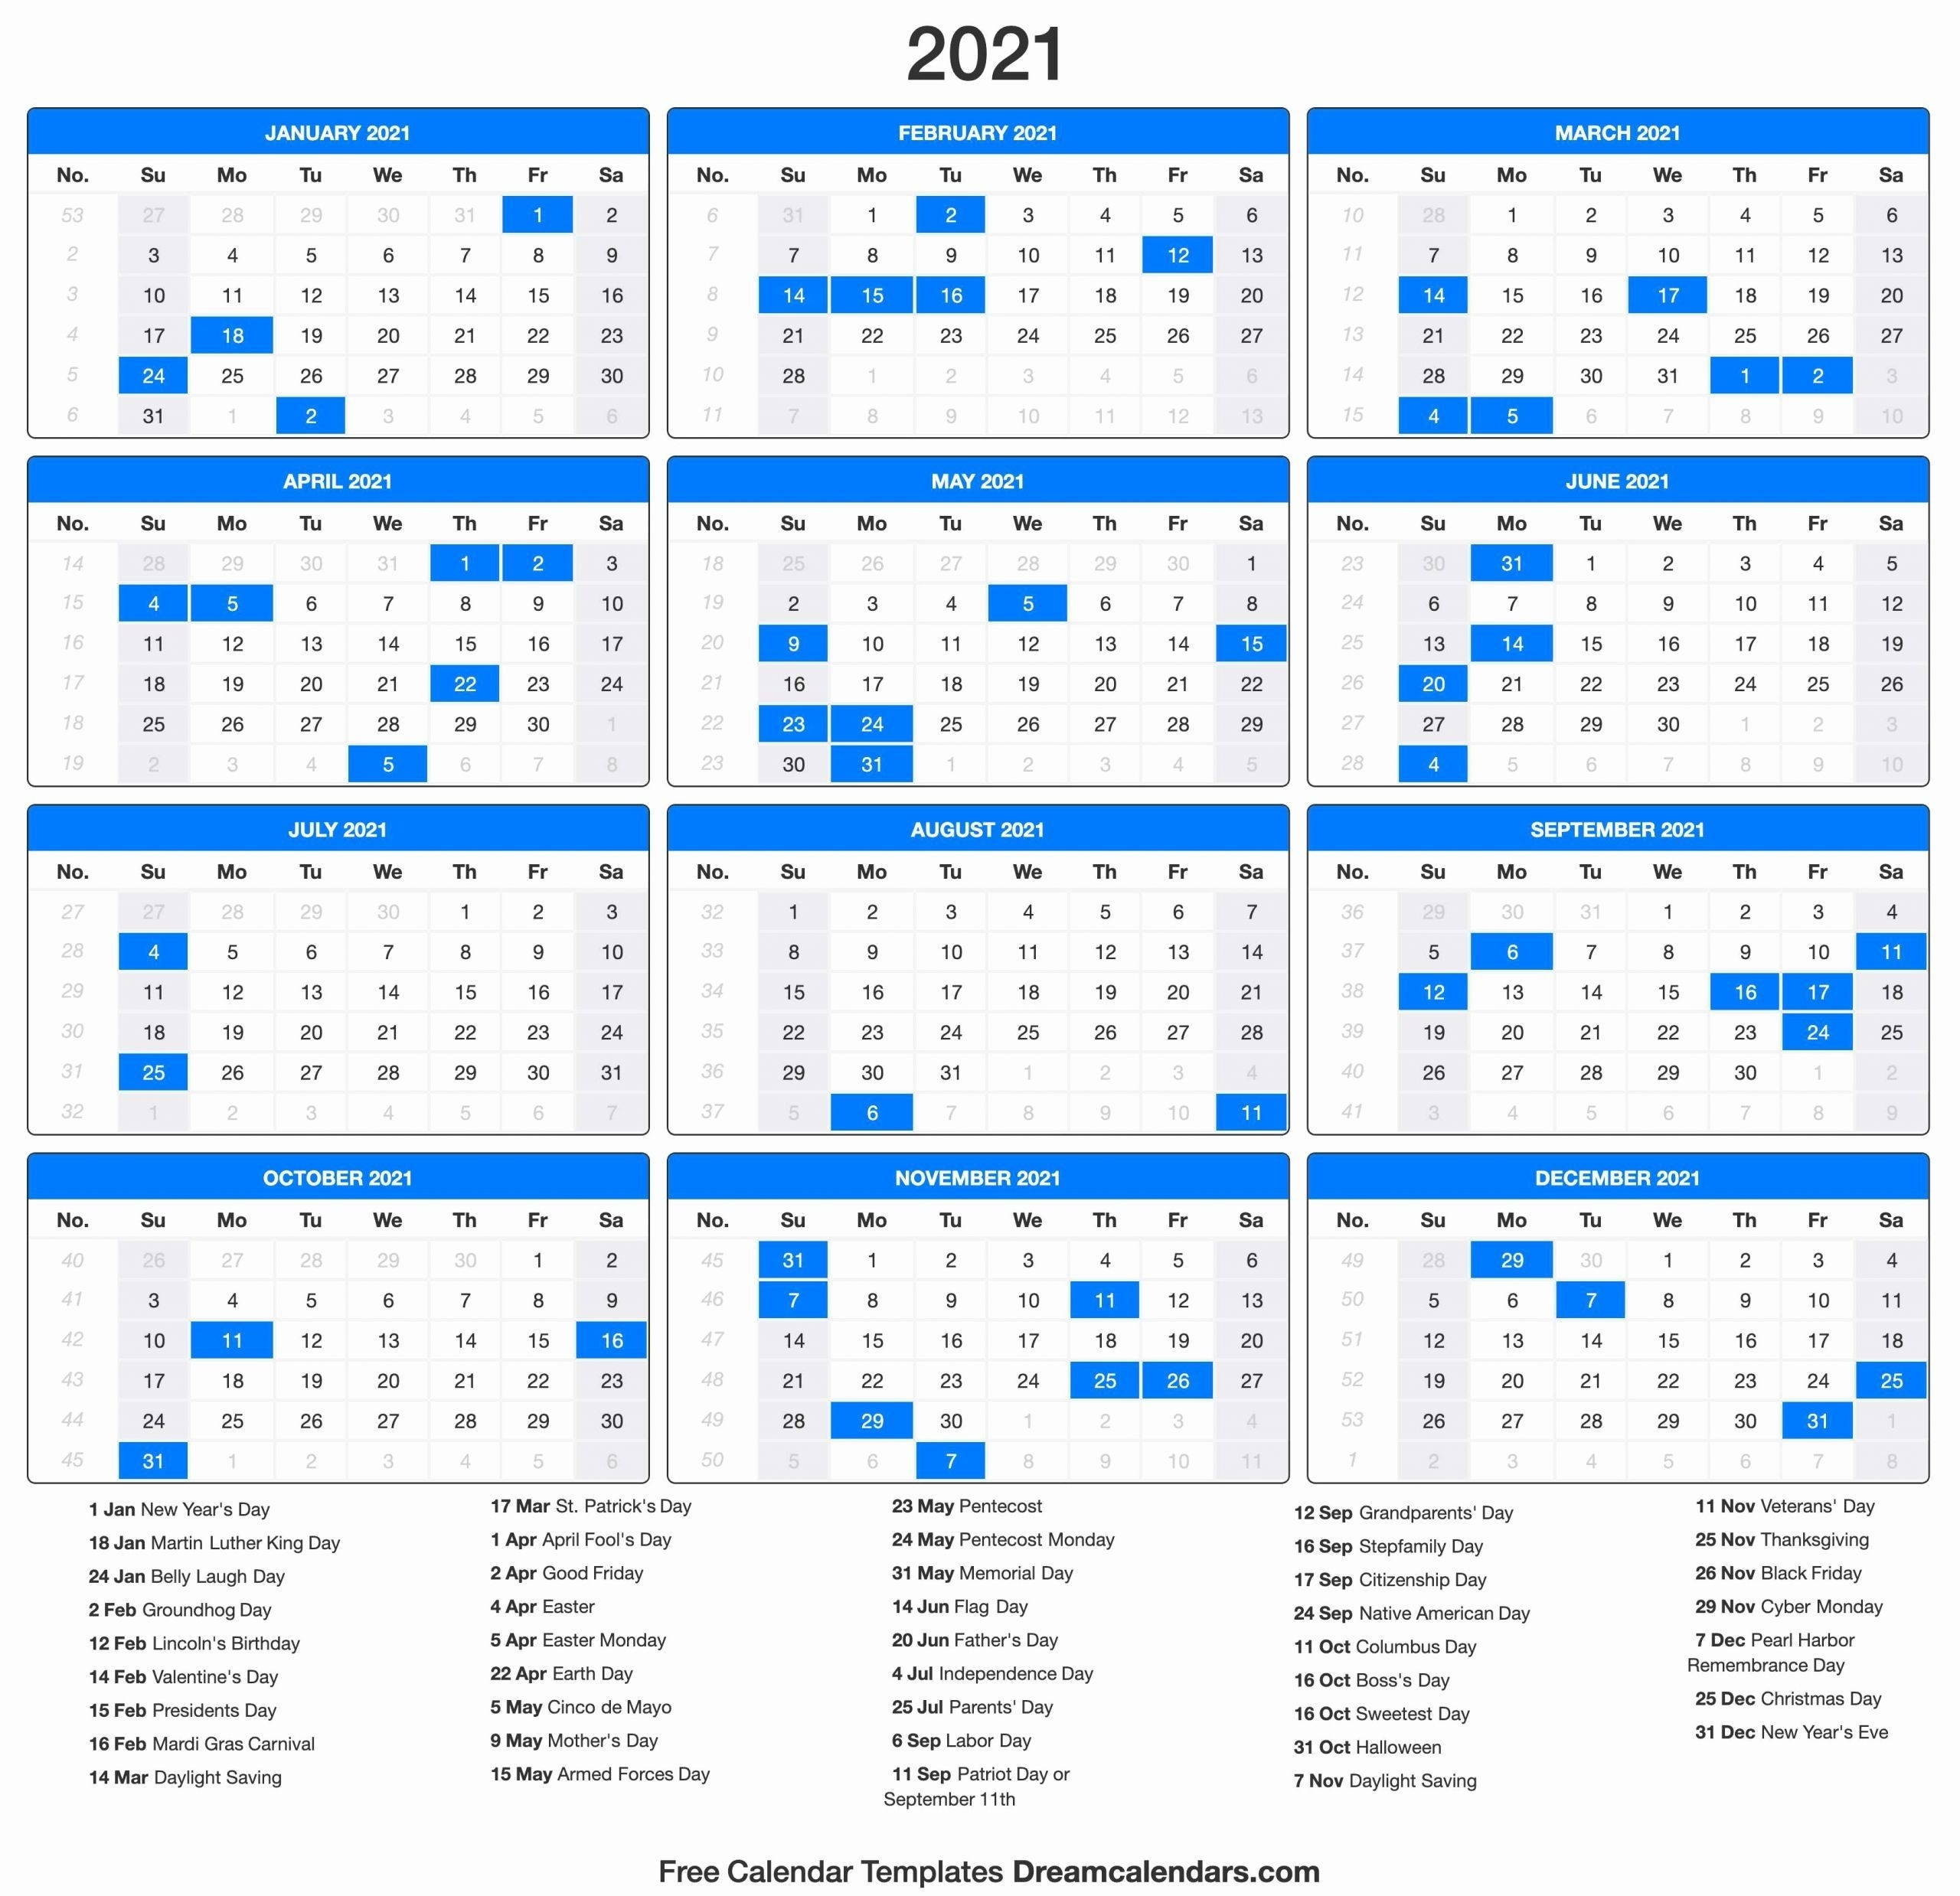 Printable Calendar 2021 | Holiday Calendar, Calendar-Printable Healthcare Awareness Calendar 2021